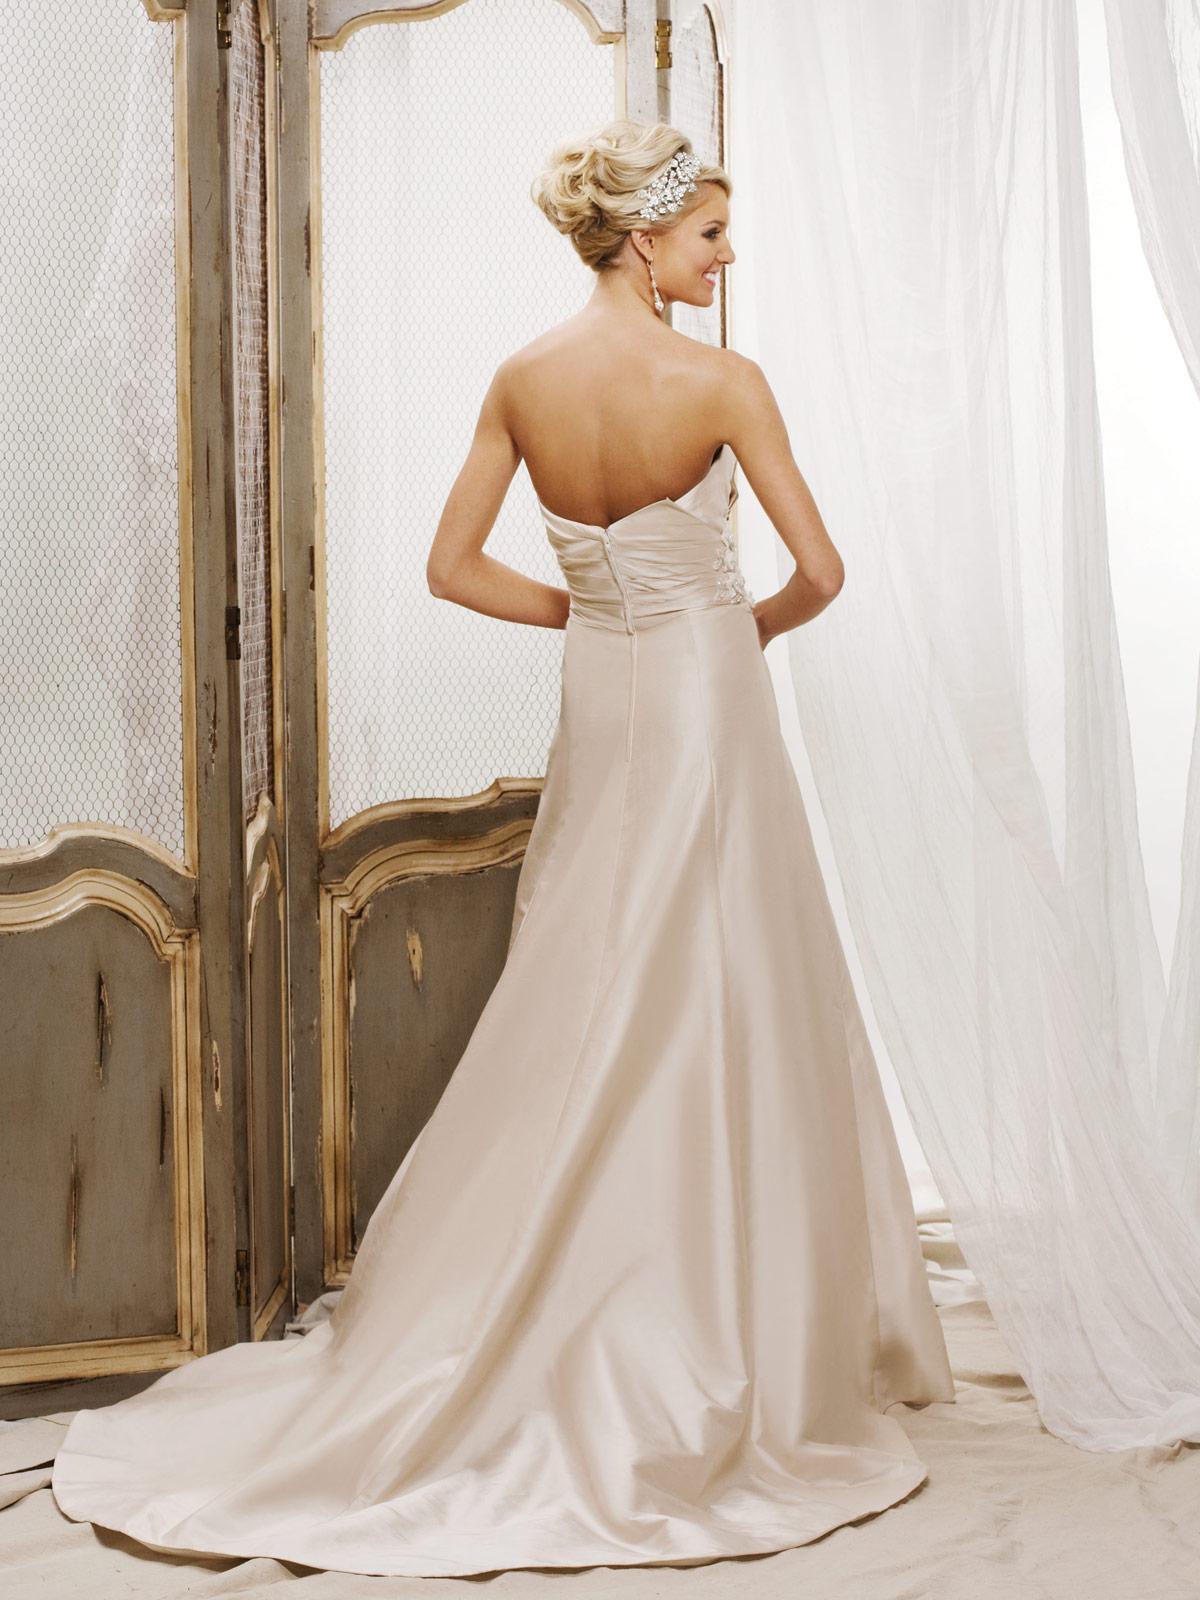 Wedding Gown Train Lengths